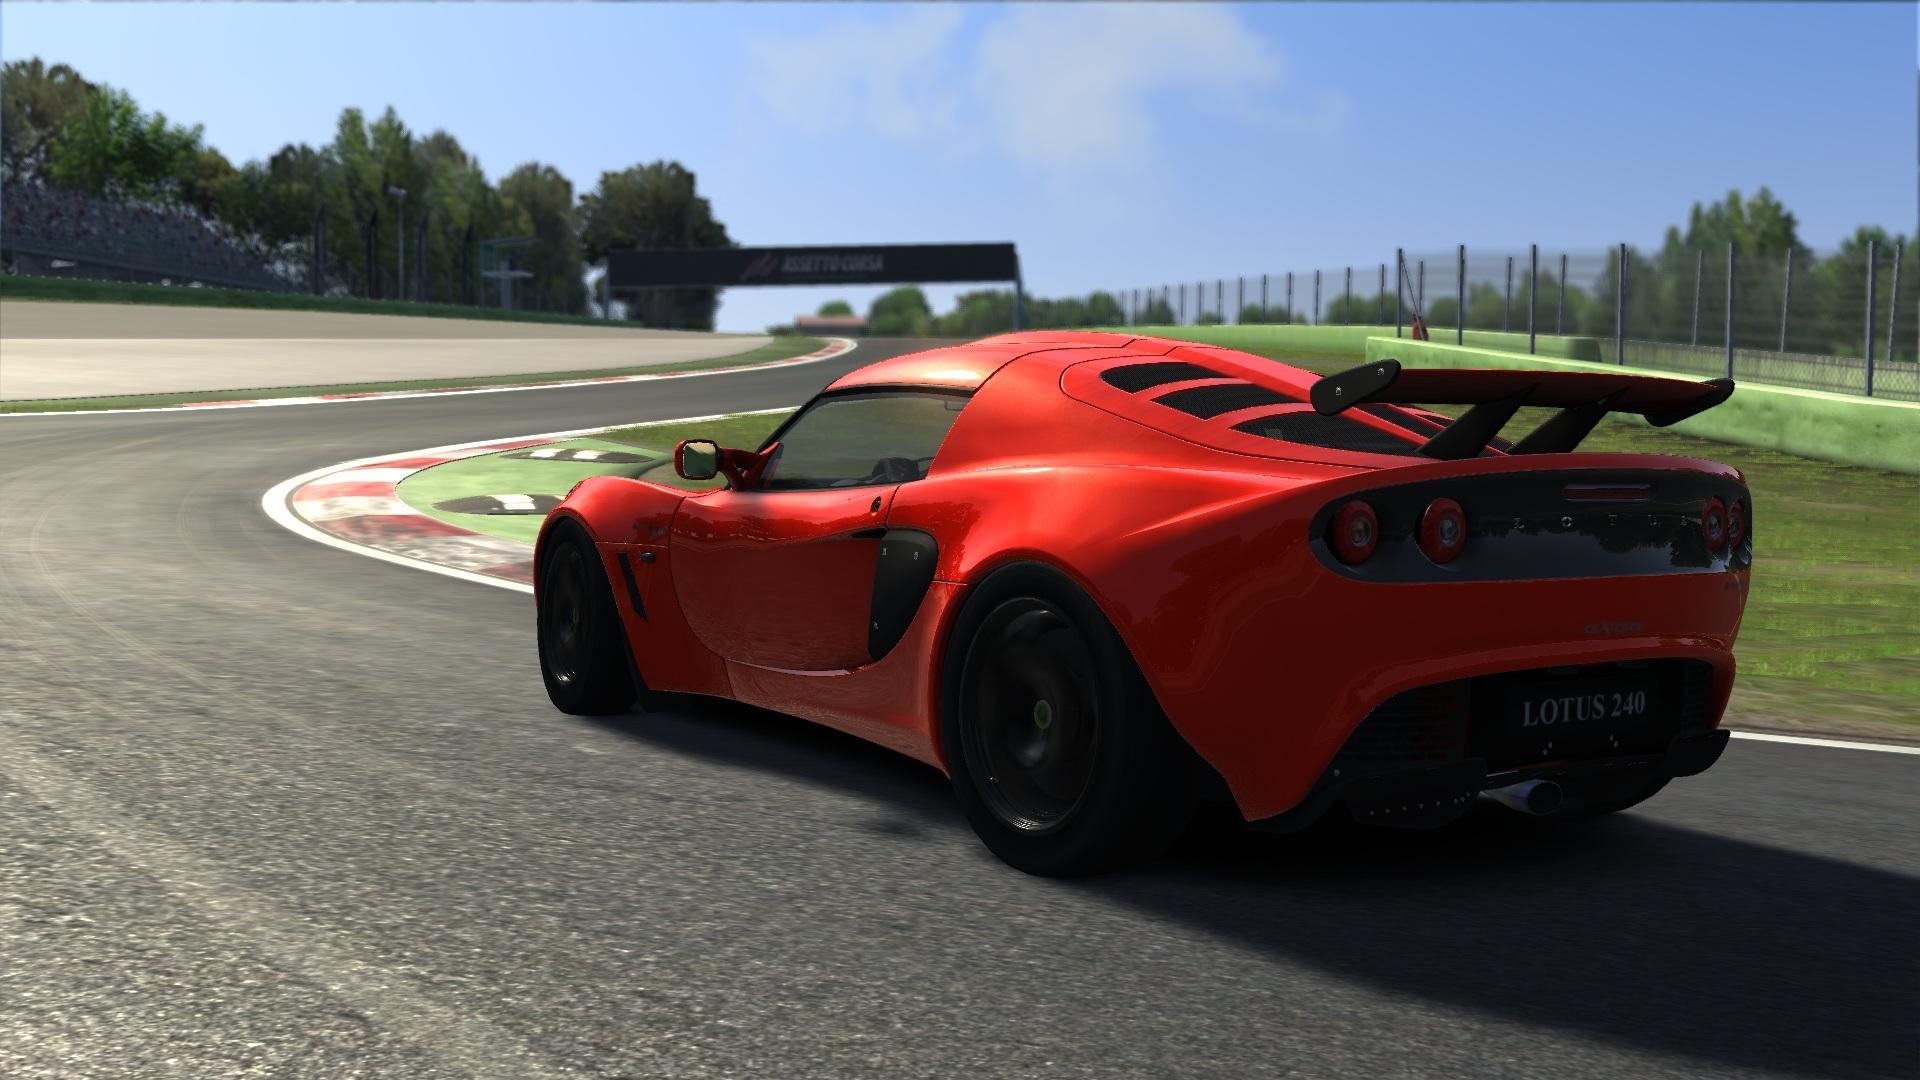 240R - Acque Mirenali